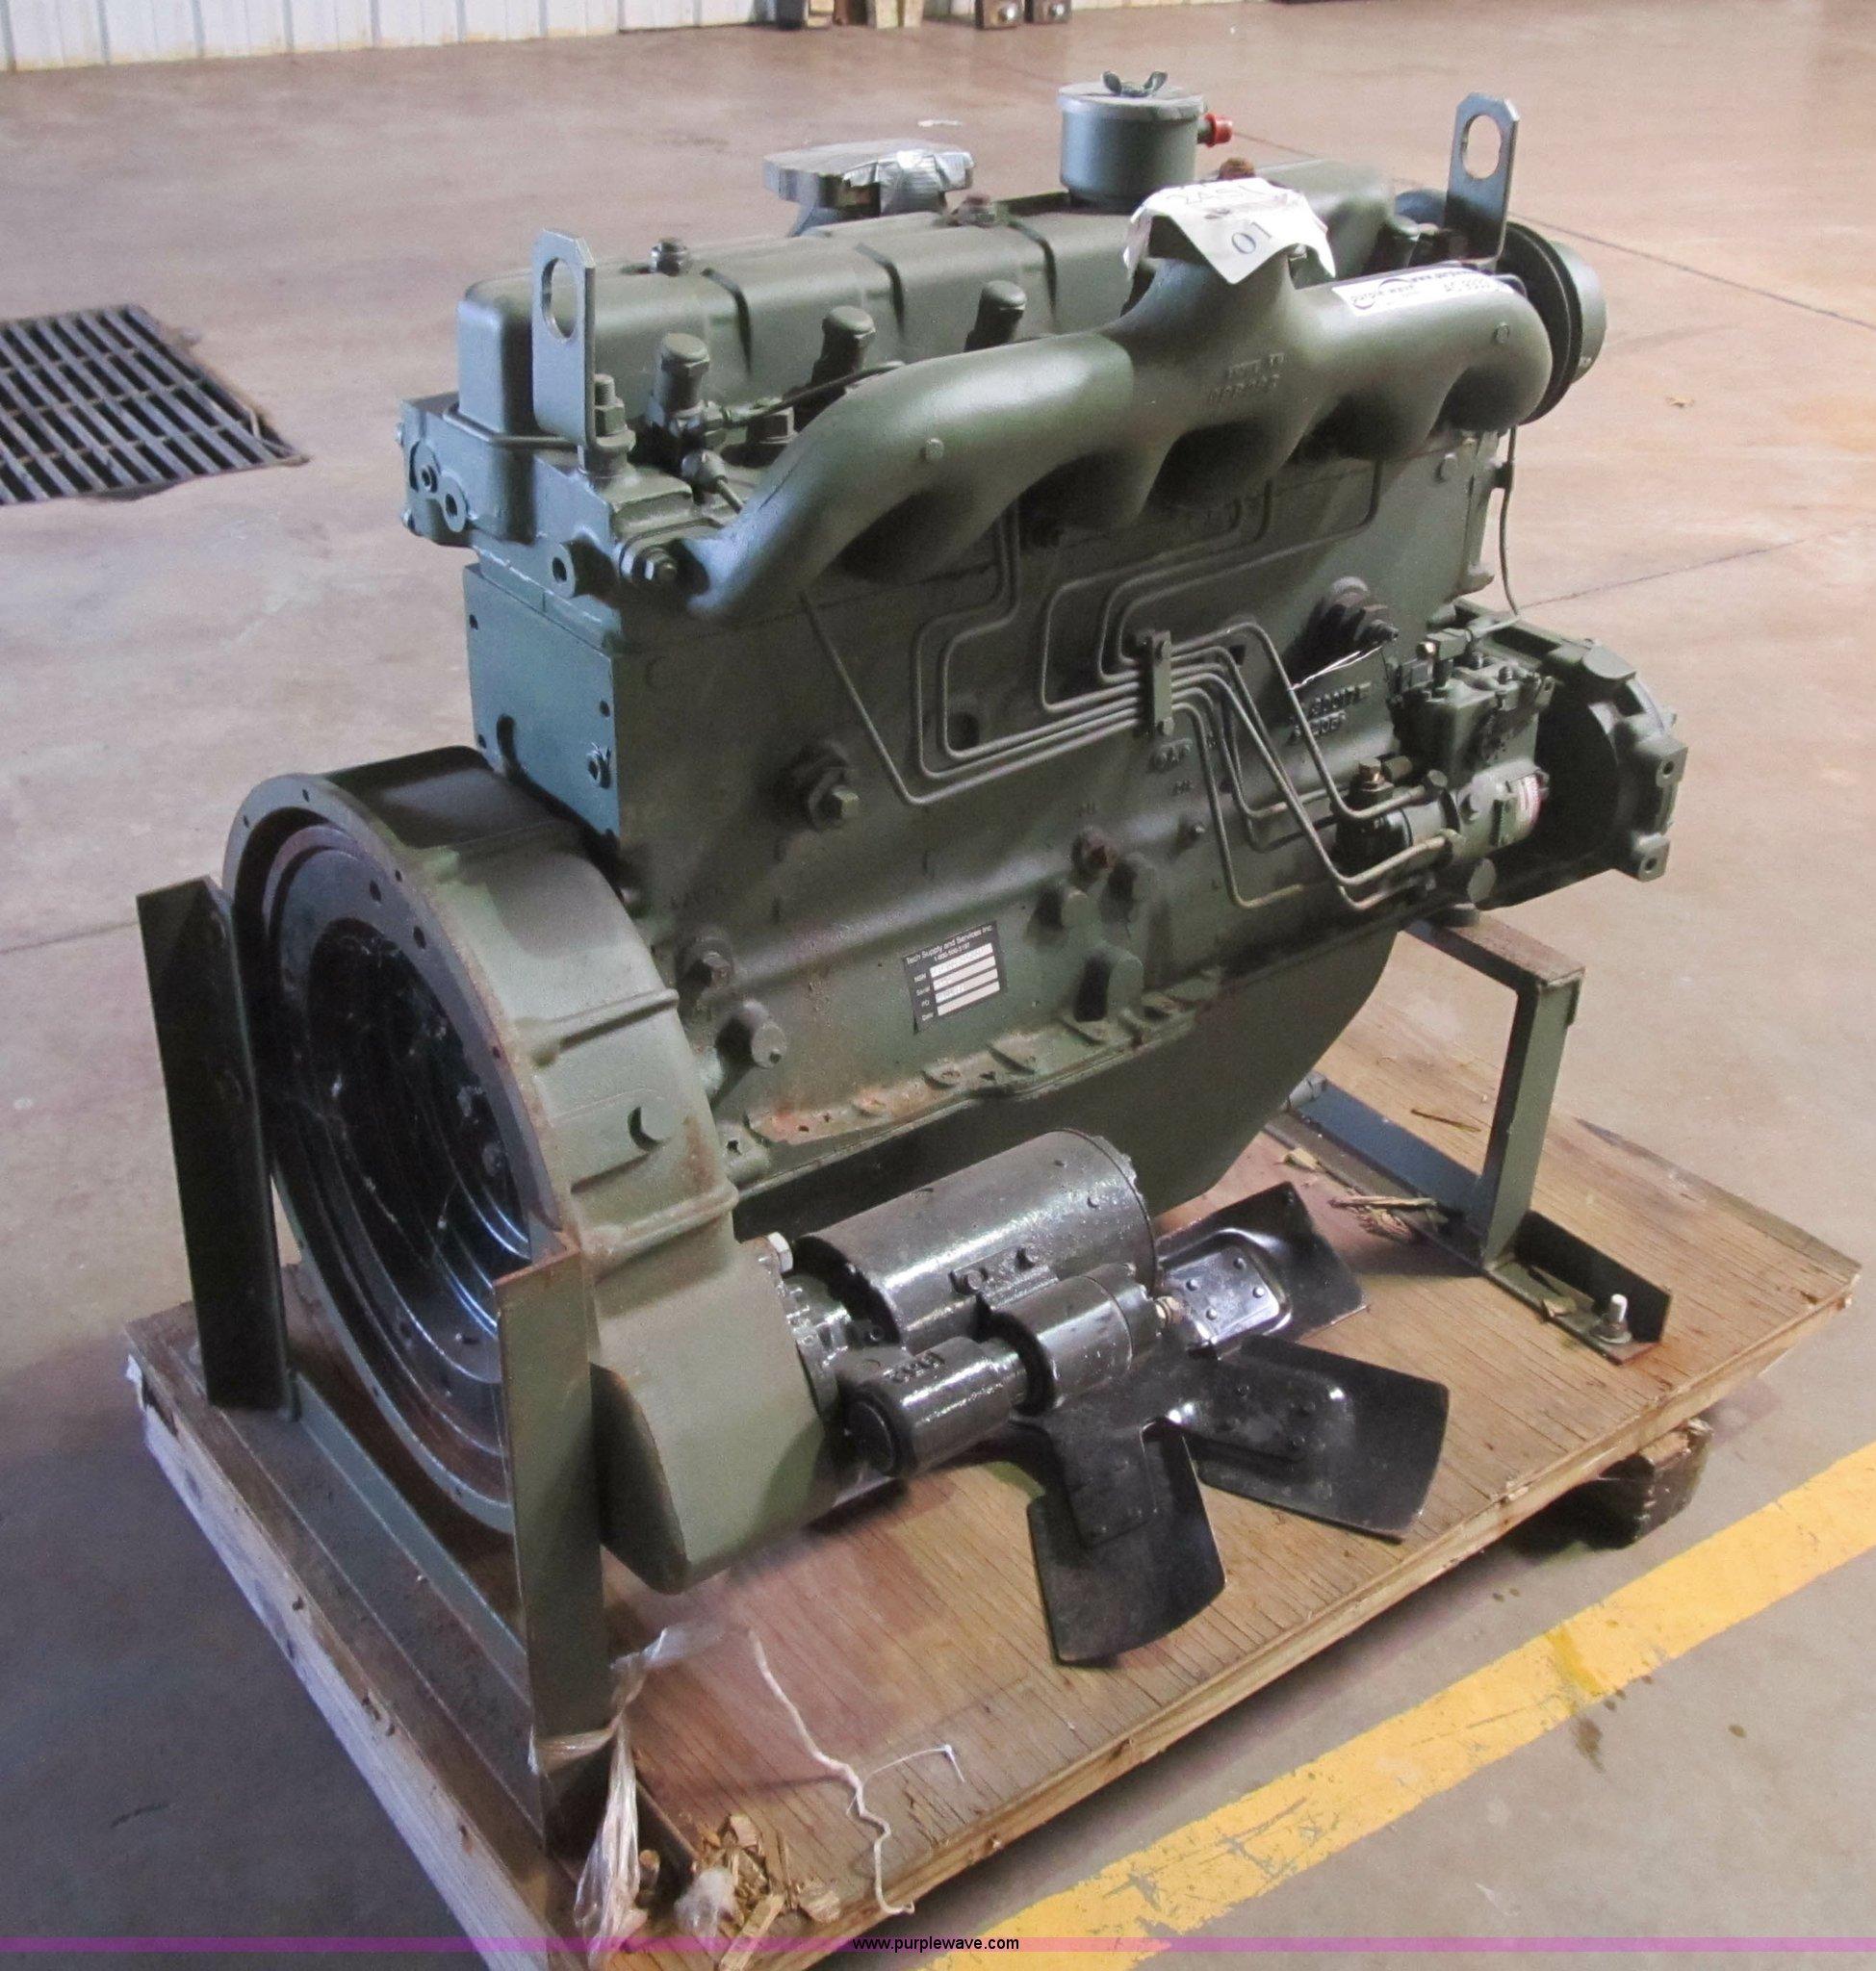 Hercules G3400t Engine - Www imagez co